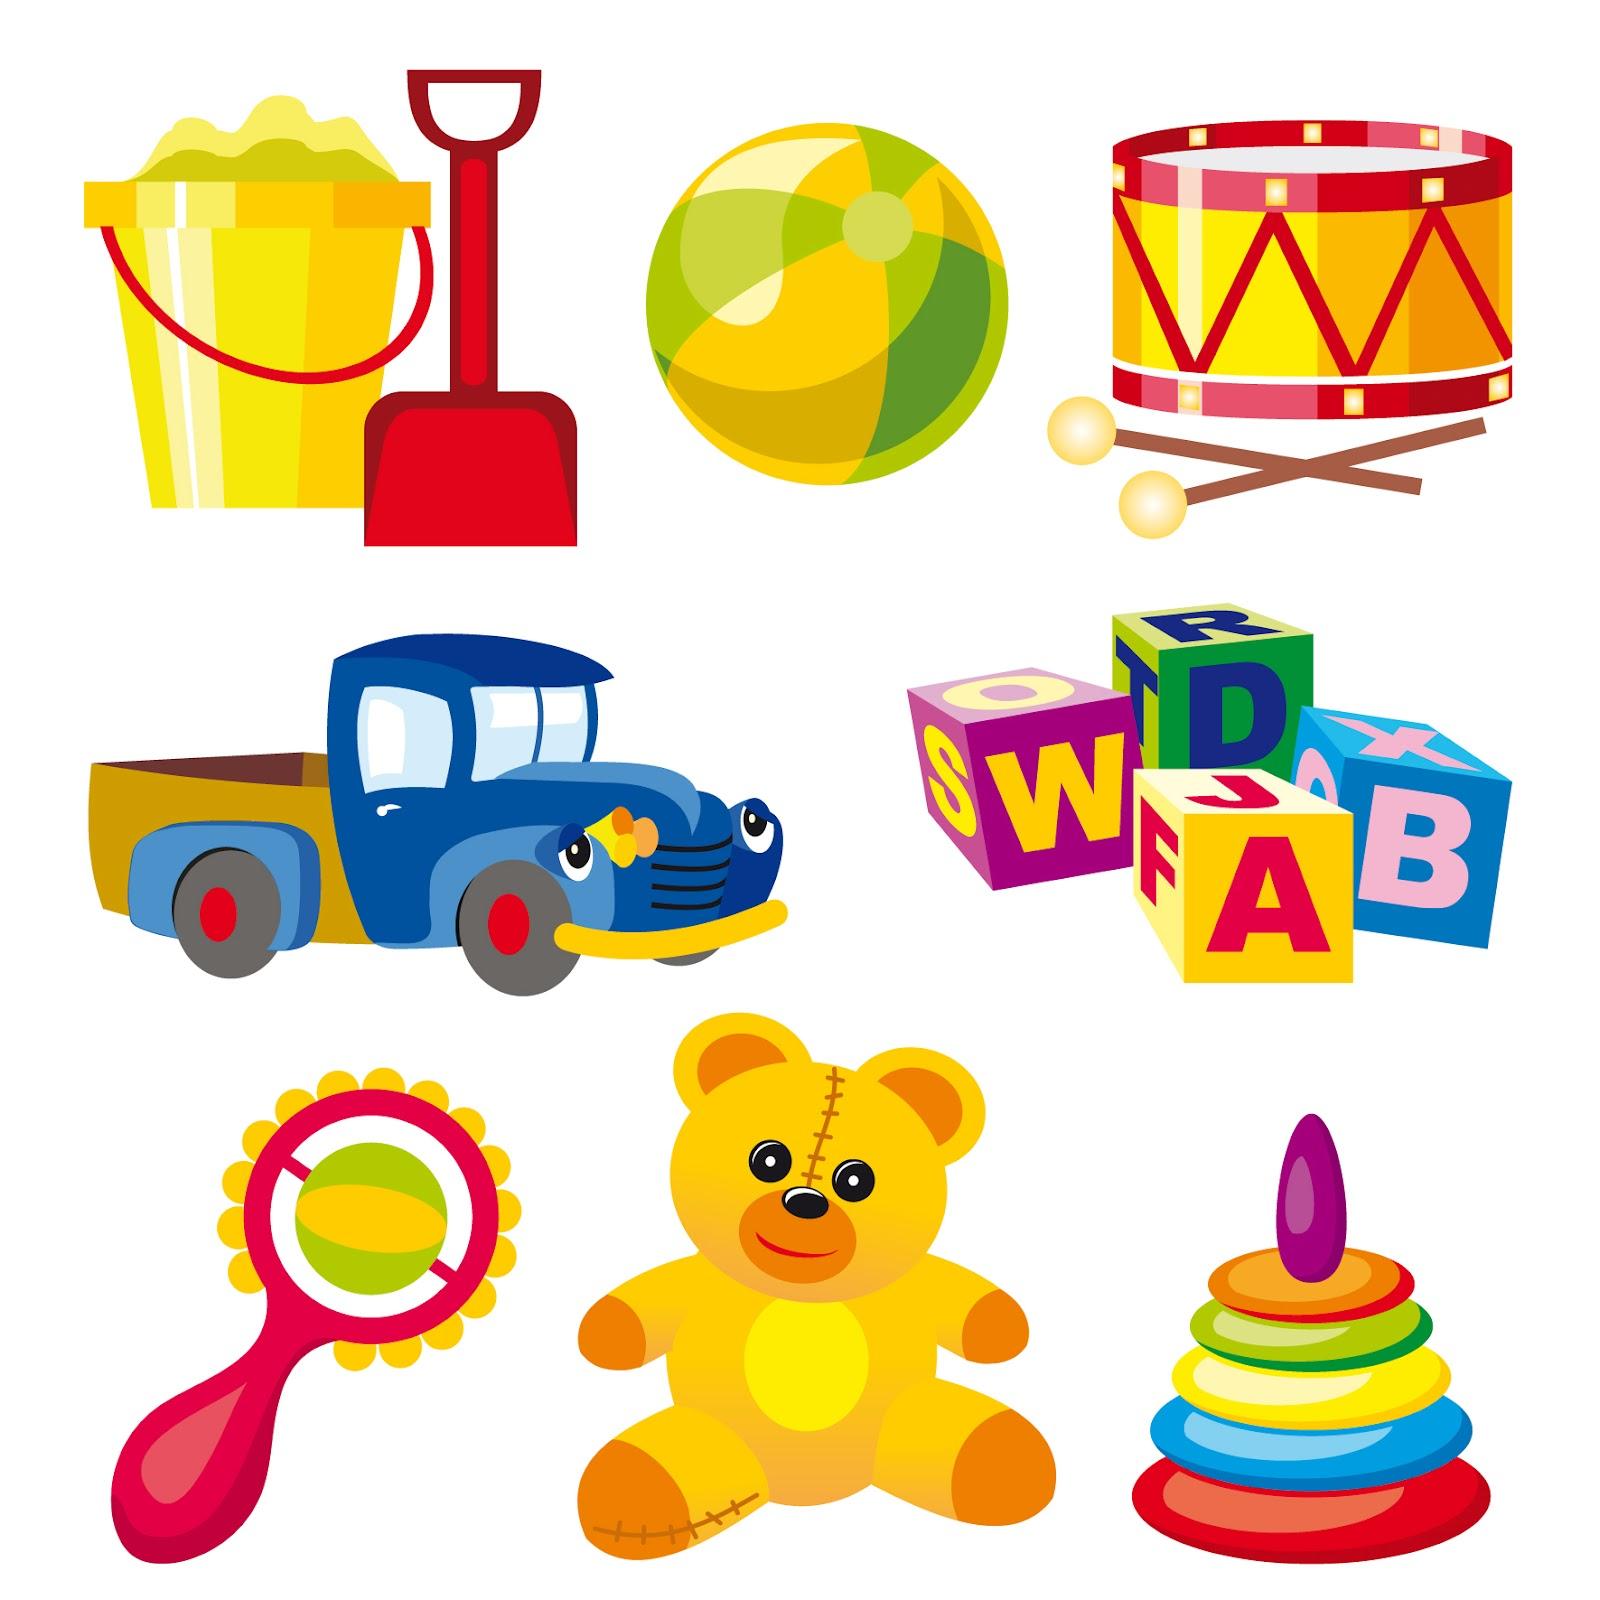 A Ton Of Rooms With Colorful Toys: Juguetes°☆Cuales Eran Tus Preferidos?